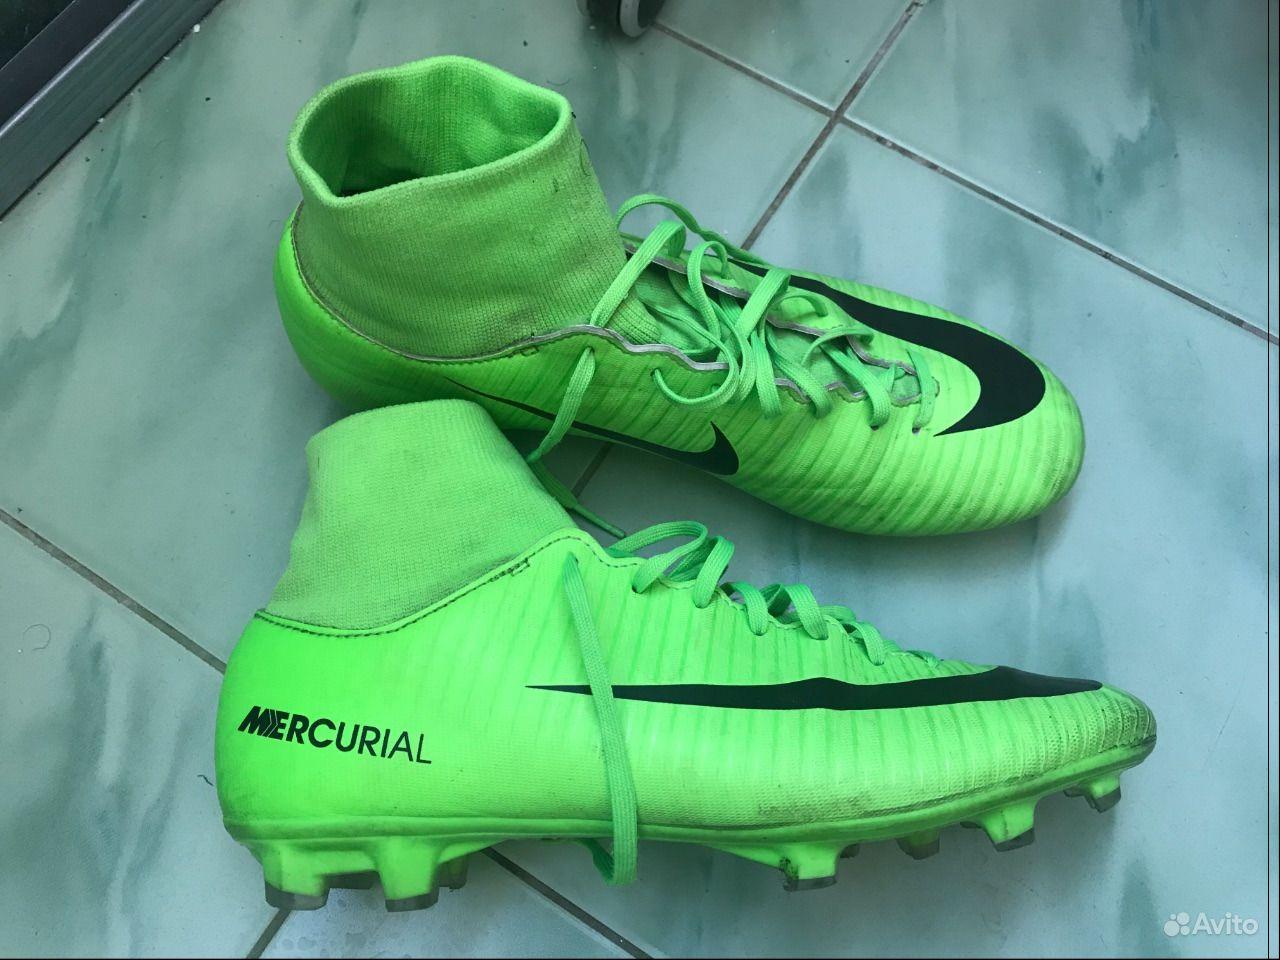 Бутсы для футбола Mercurial  dae202f920eb7